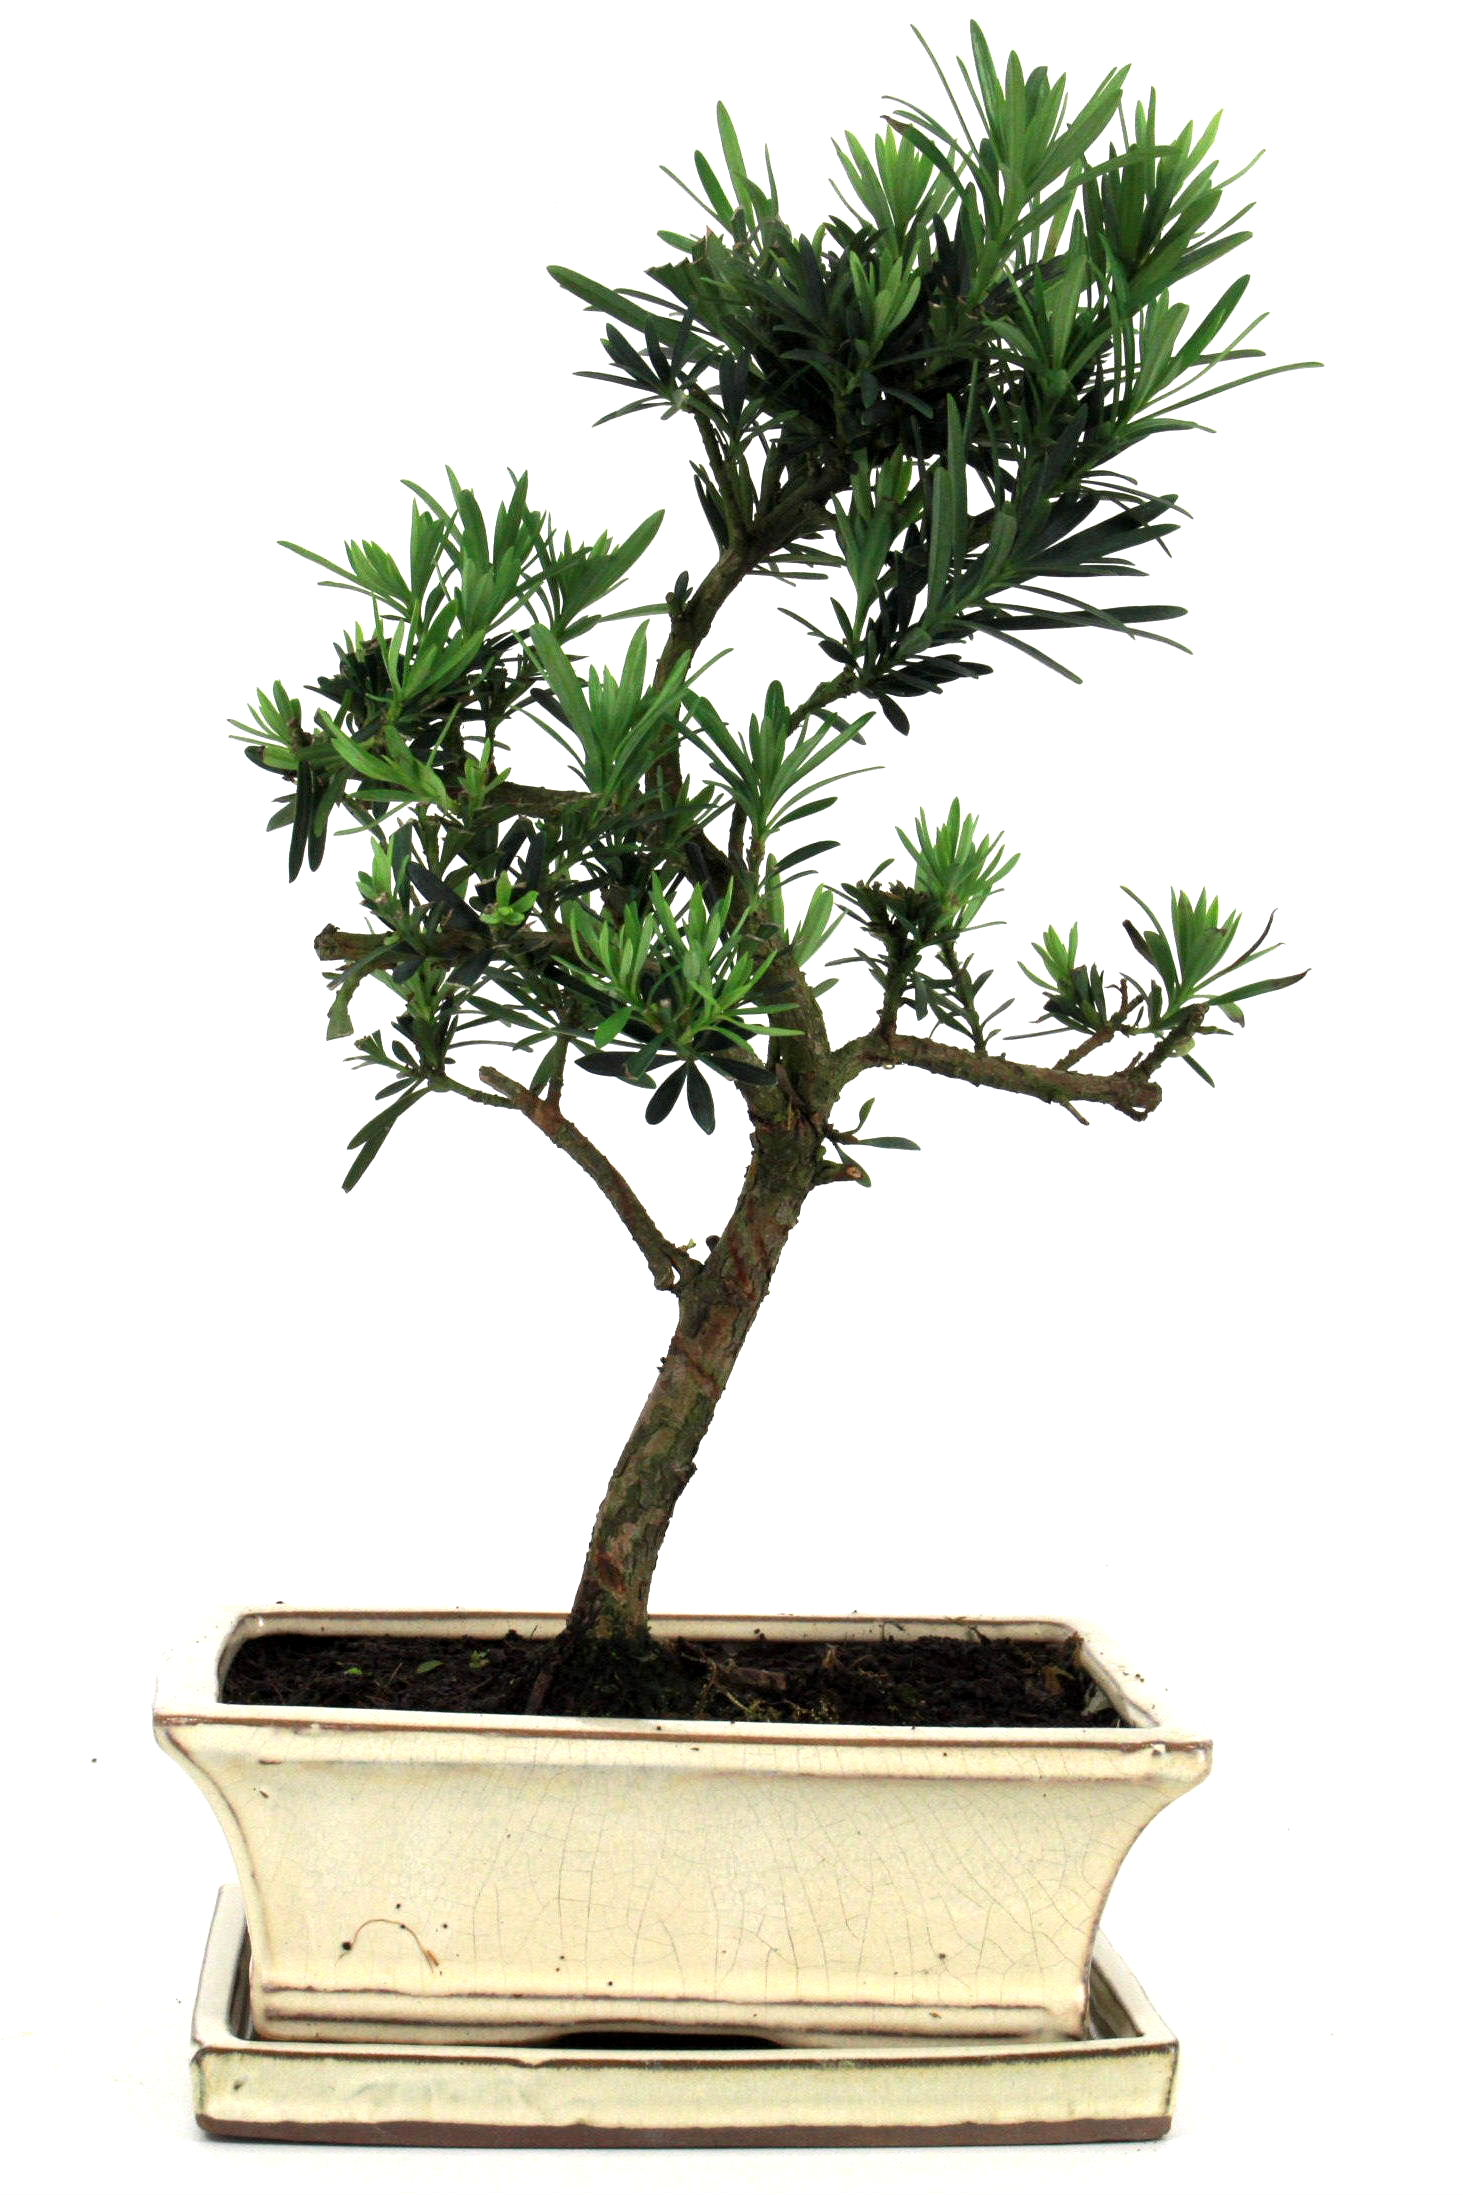 steineibe bonsai 35 40 cm 1932 bei oyaki bonsai kaufen. Black Bedroom Furniture Sets. Home Design Ideas